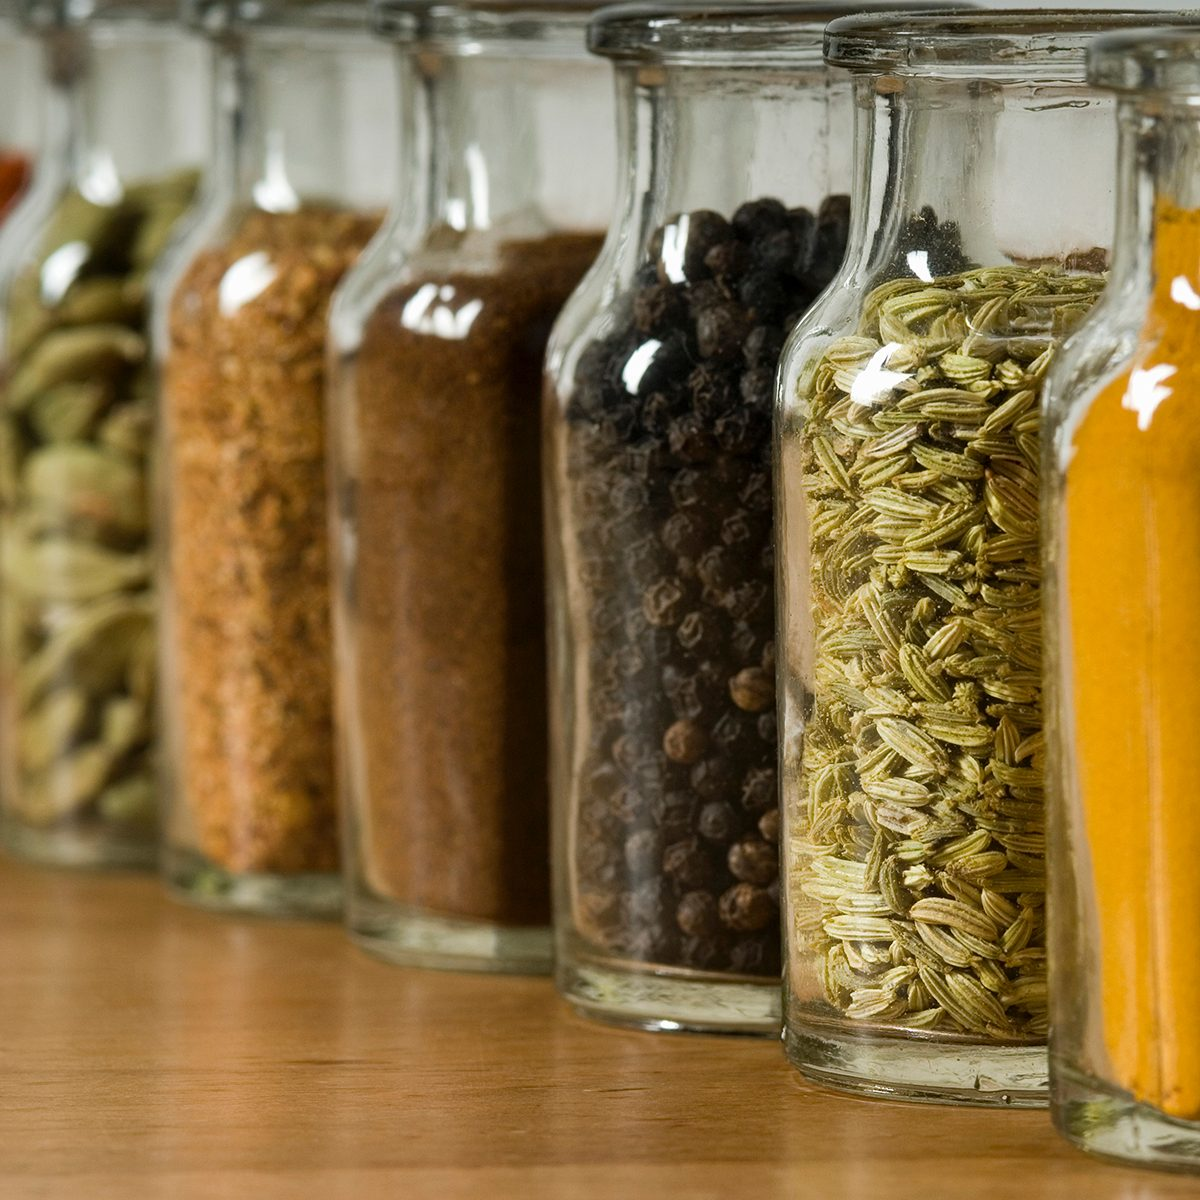 Row of spice jars